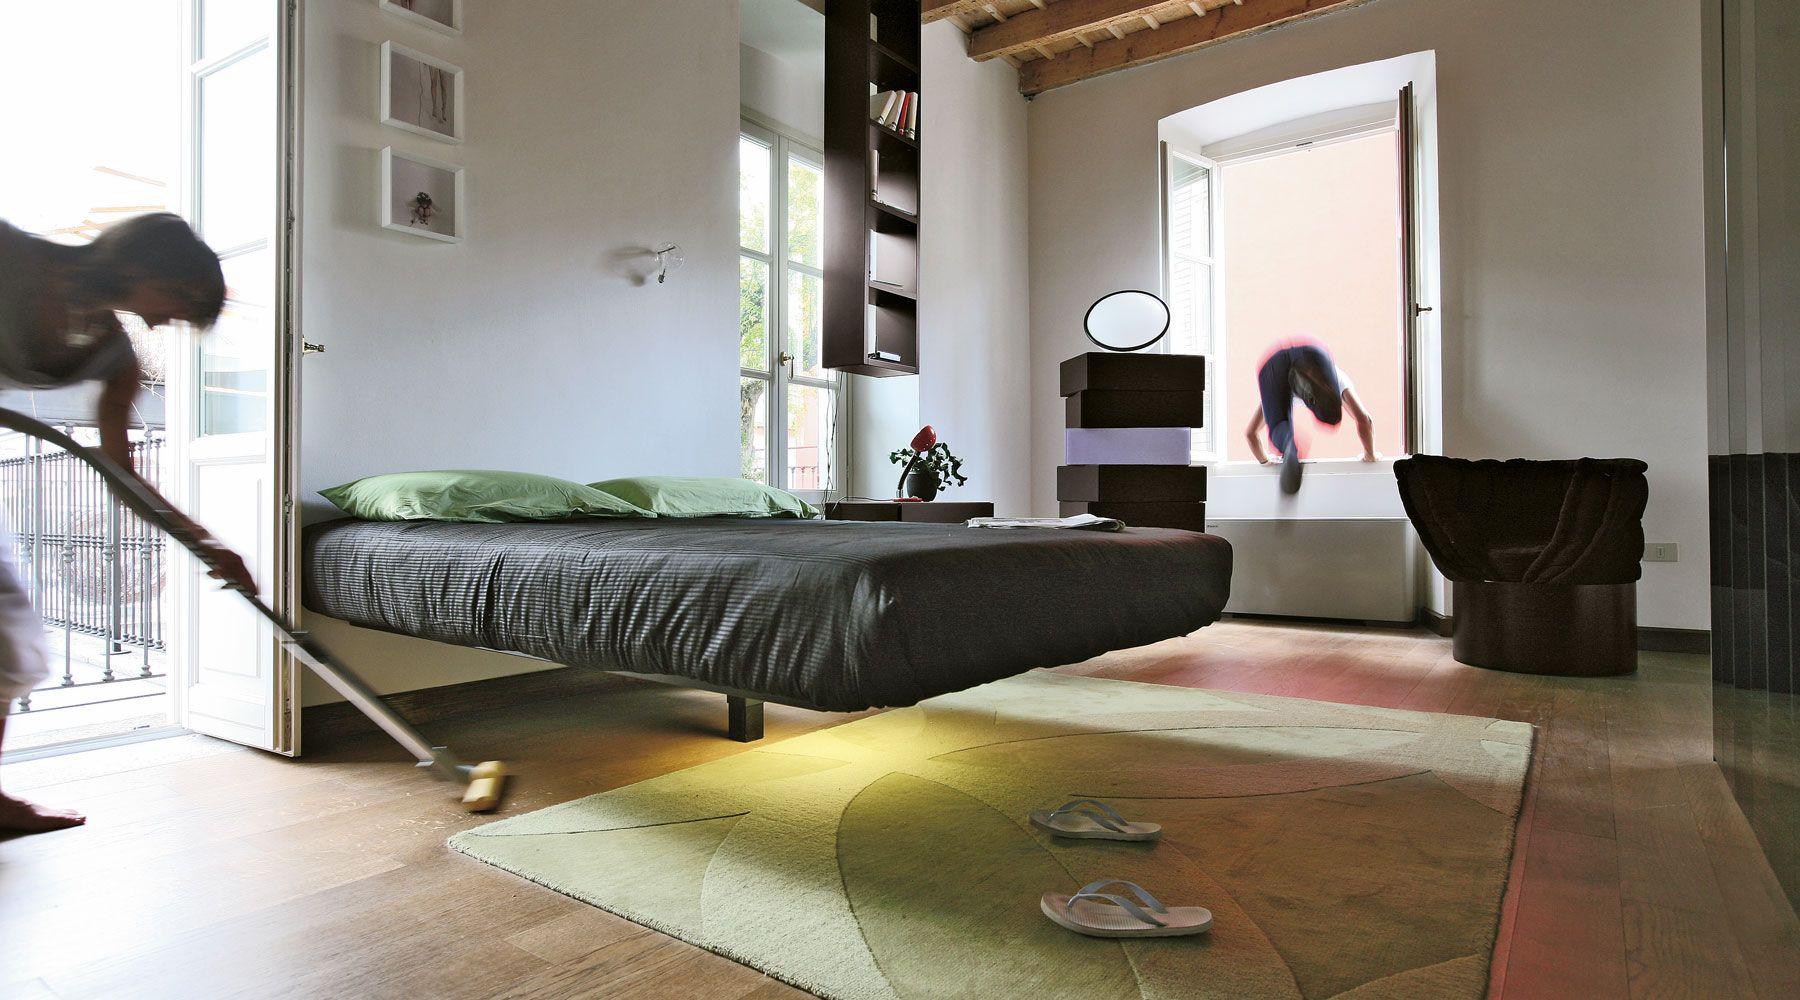 Letto-Fluttua - Copy | Beds | Pinterest | Suspended bed, Smart ...